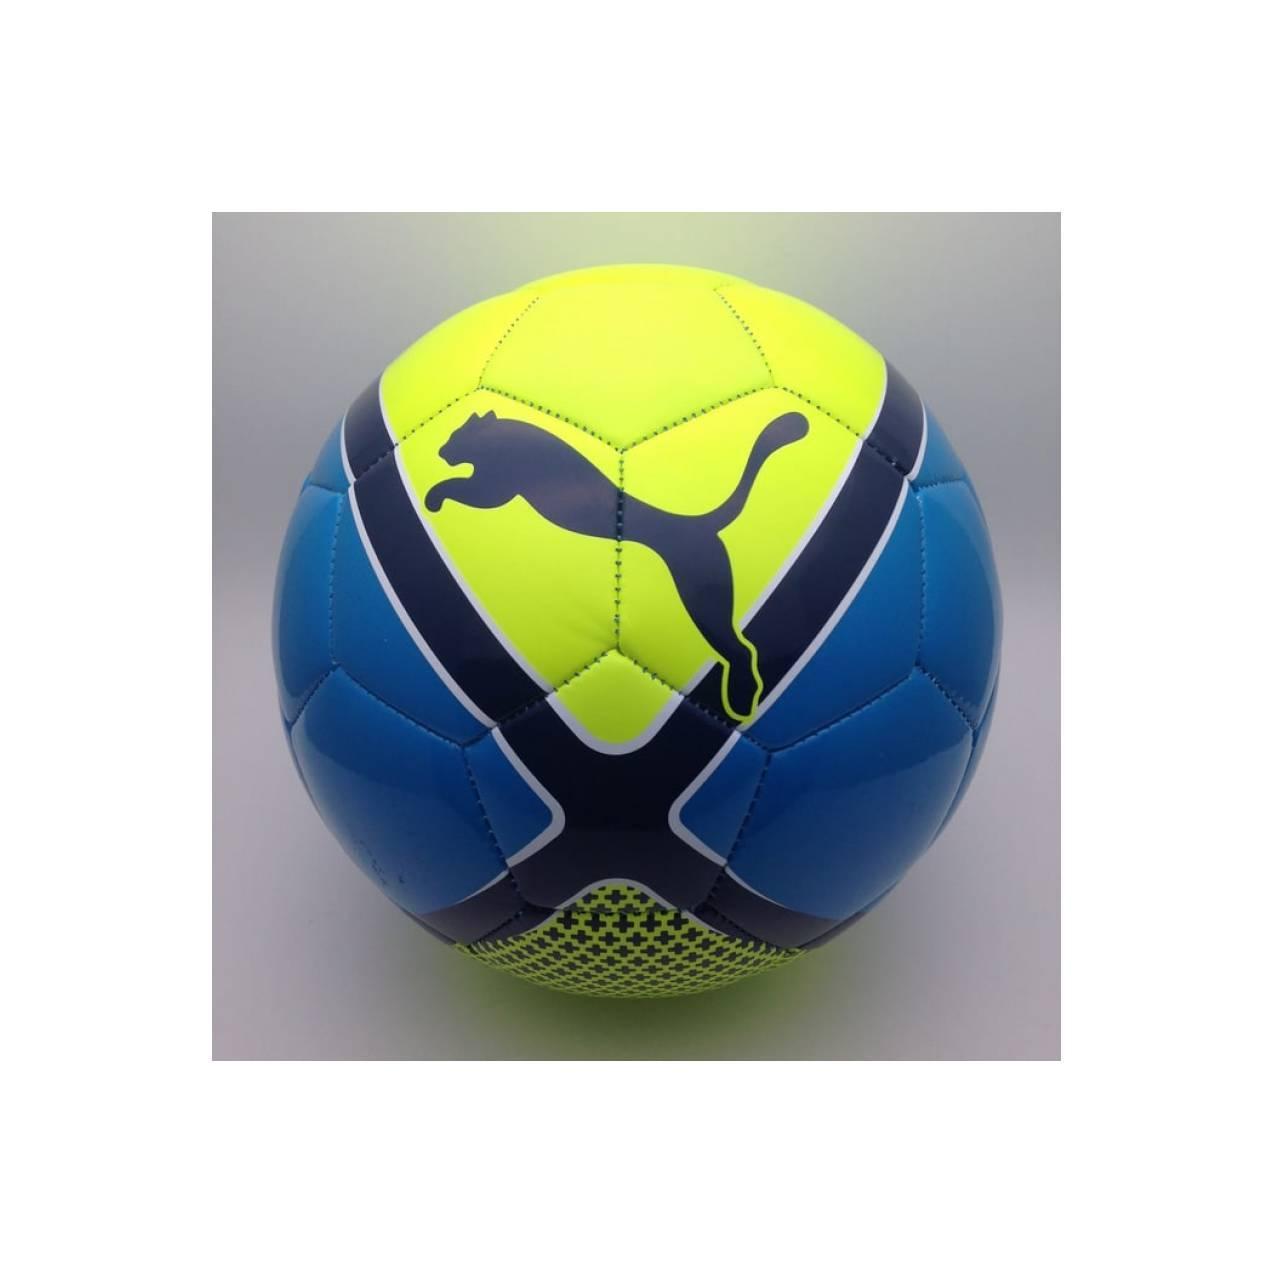 a3cd2ba06e Adidas Bola Futsal Confederation Az3203 - Daftar Harga Terkini dan ...